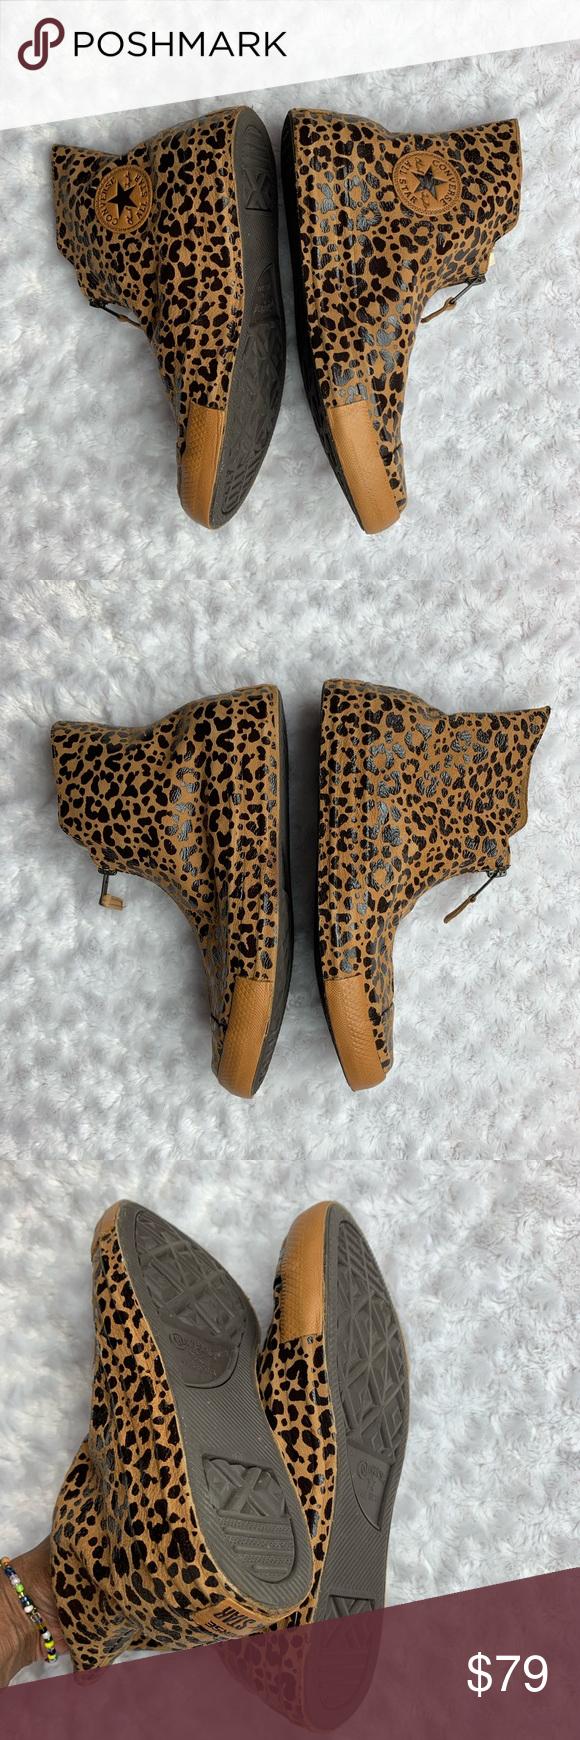 13++ True craft leopard booties ideas in 2021